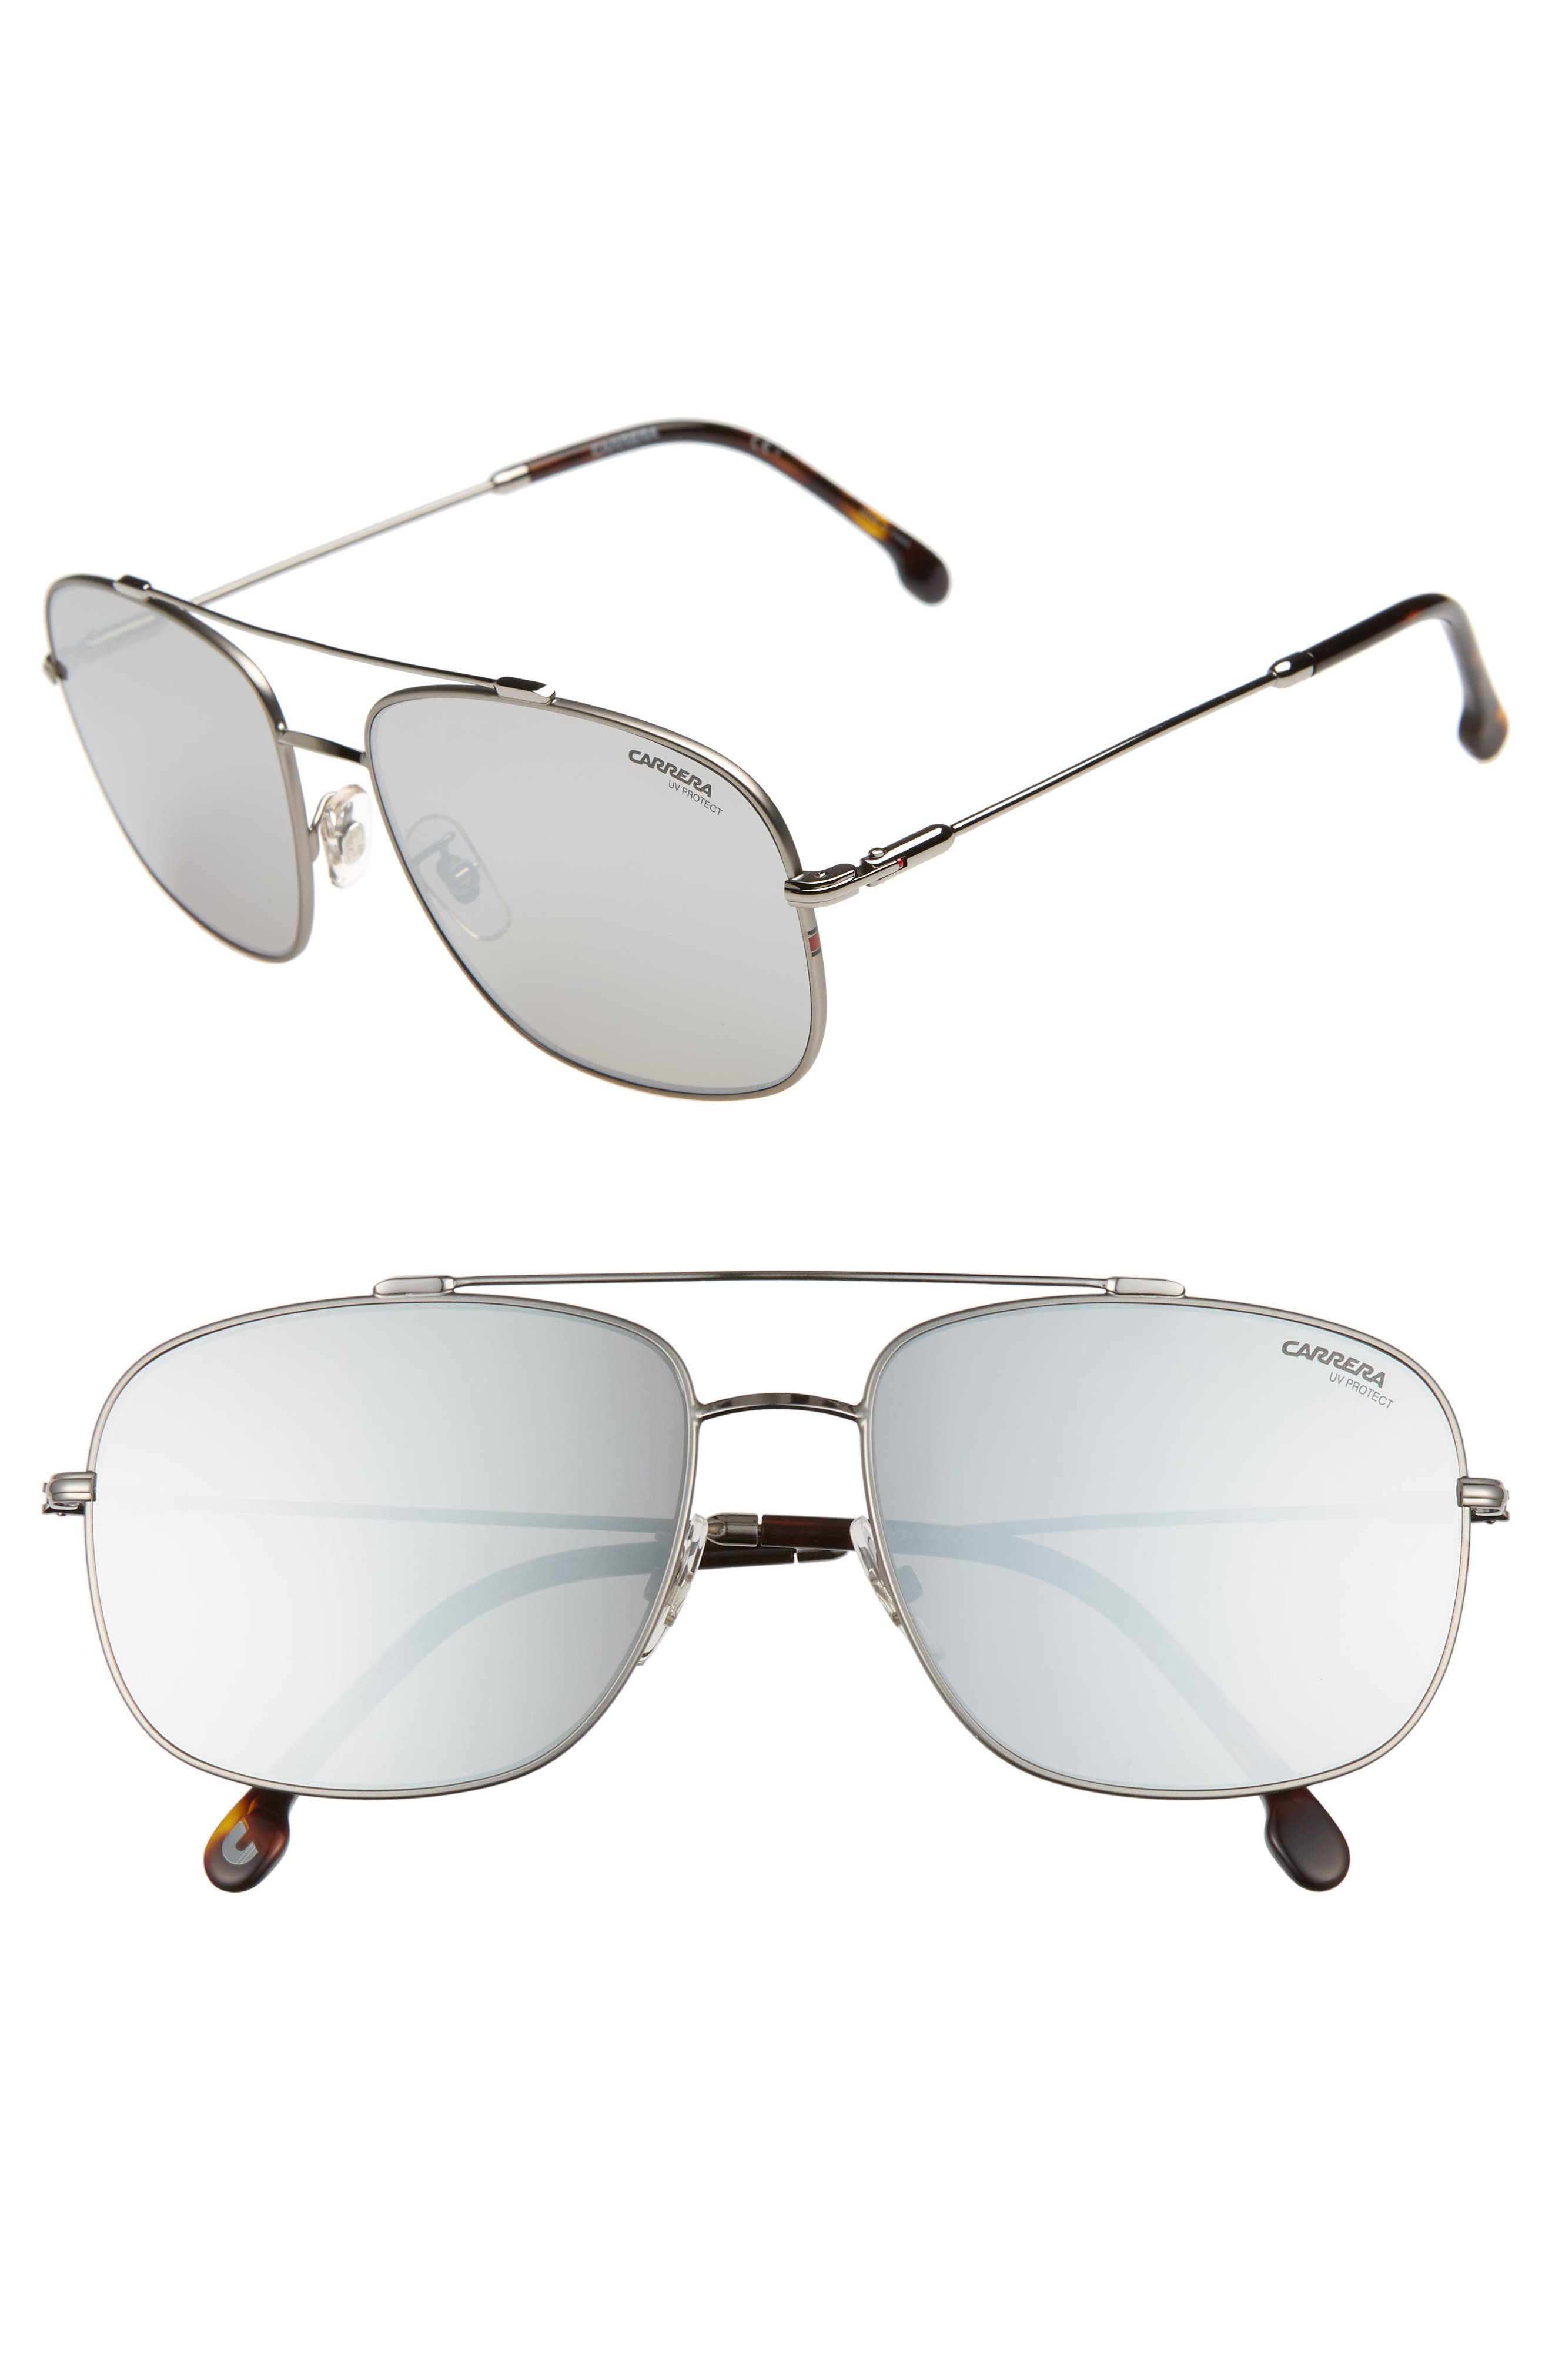 Carrera Eyewear 60Mm Special Fit Aviator Sunglasses -